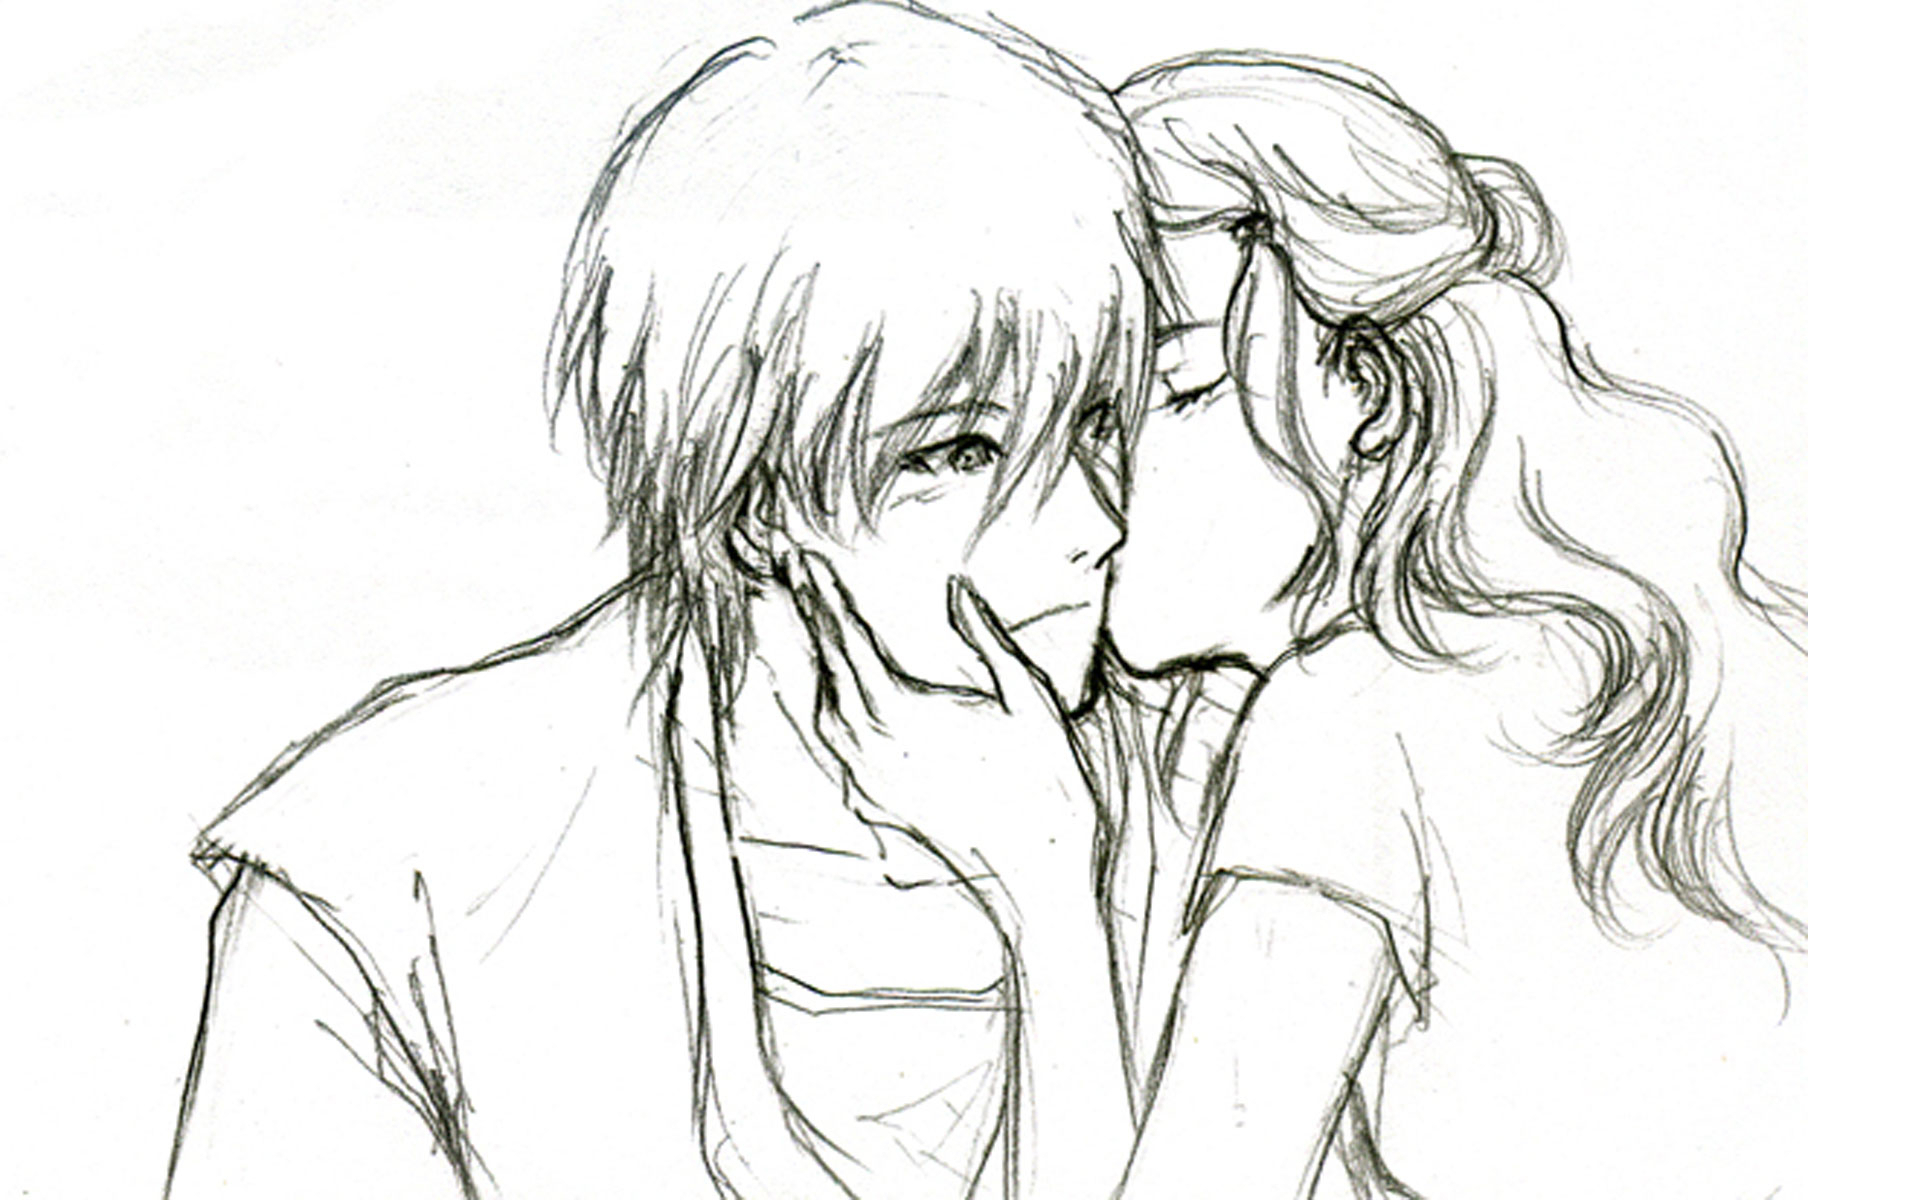 1920x1200 Love Sketch Wallpaper Boy Girl Love Sketch Wallpaper Girls